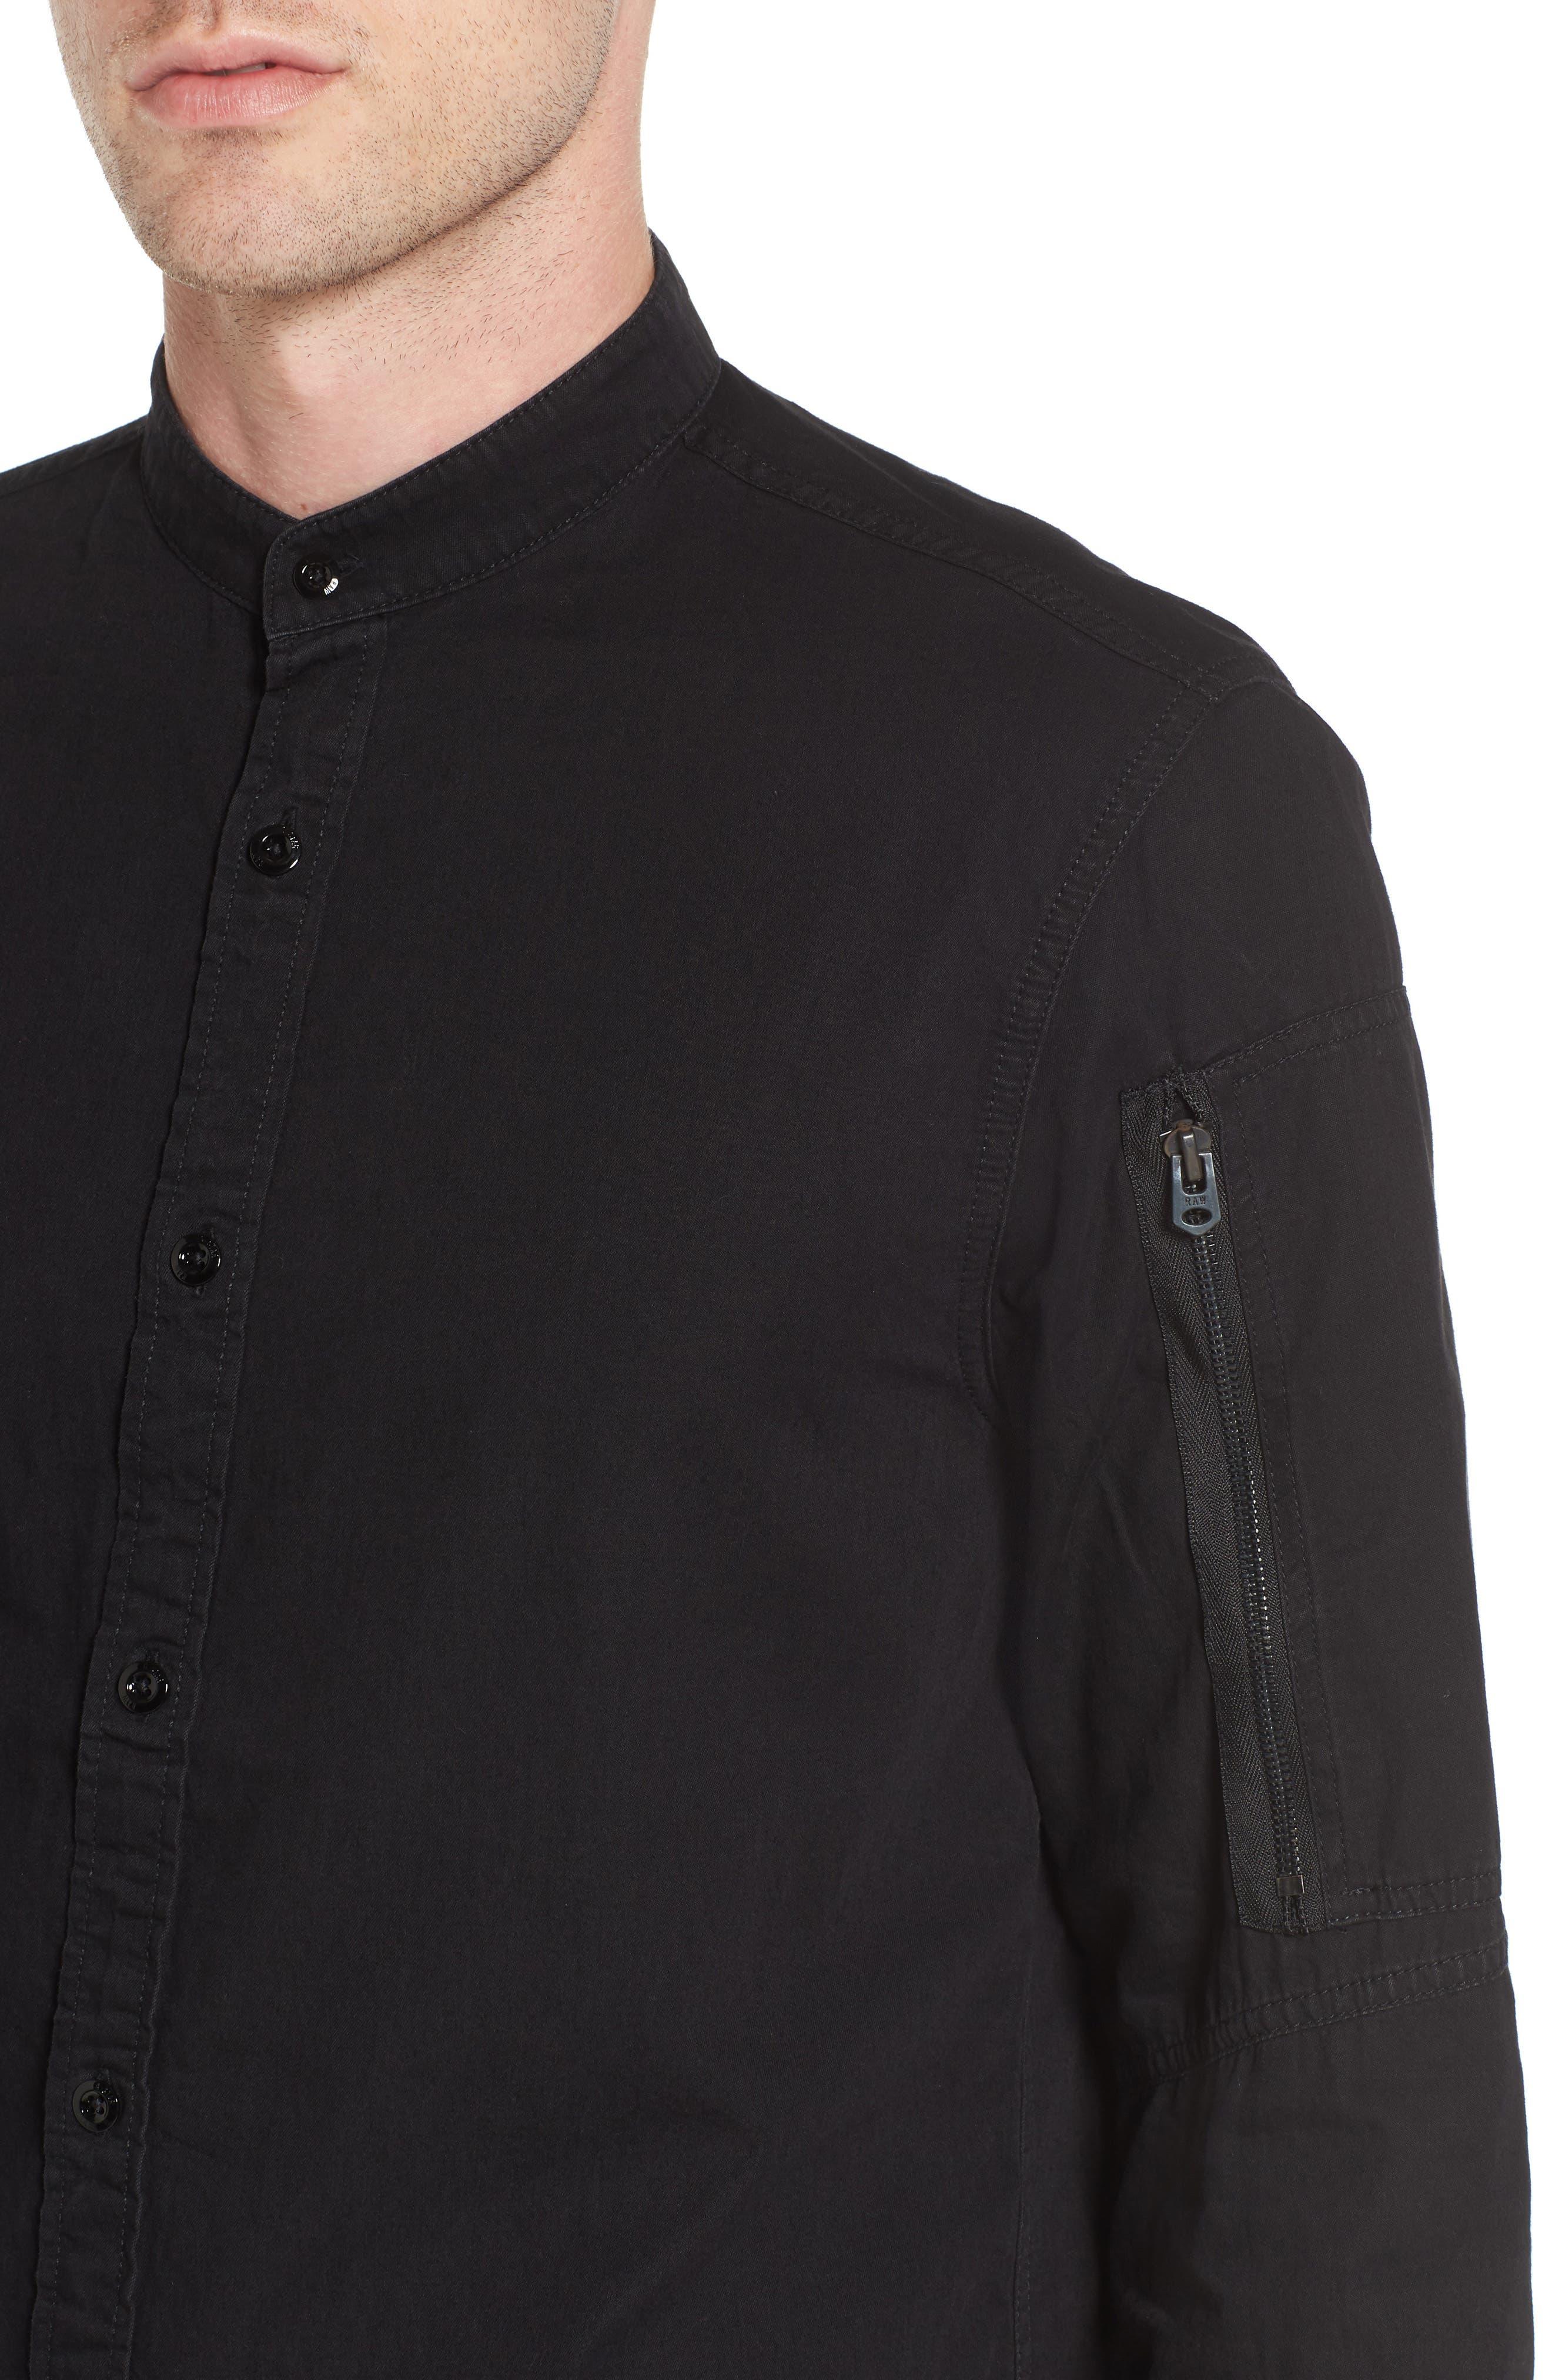 Stalt C-Less Shirt,                             Alternate thumbnail 4, color,                             001